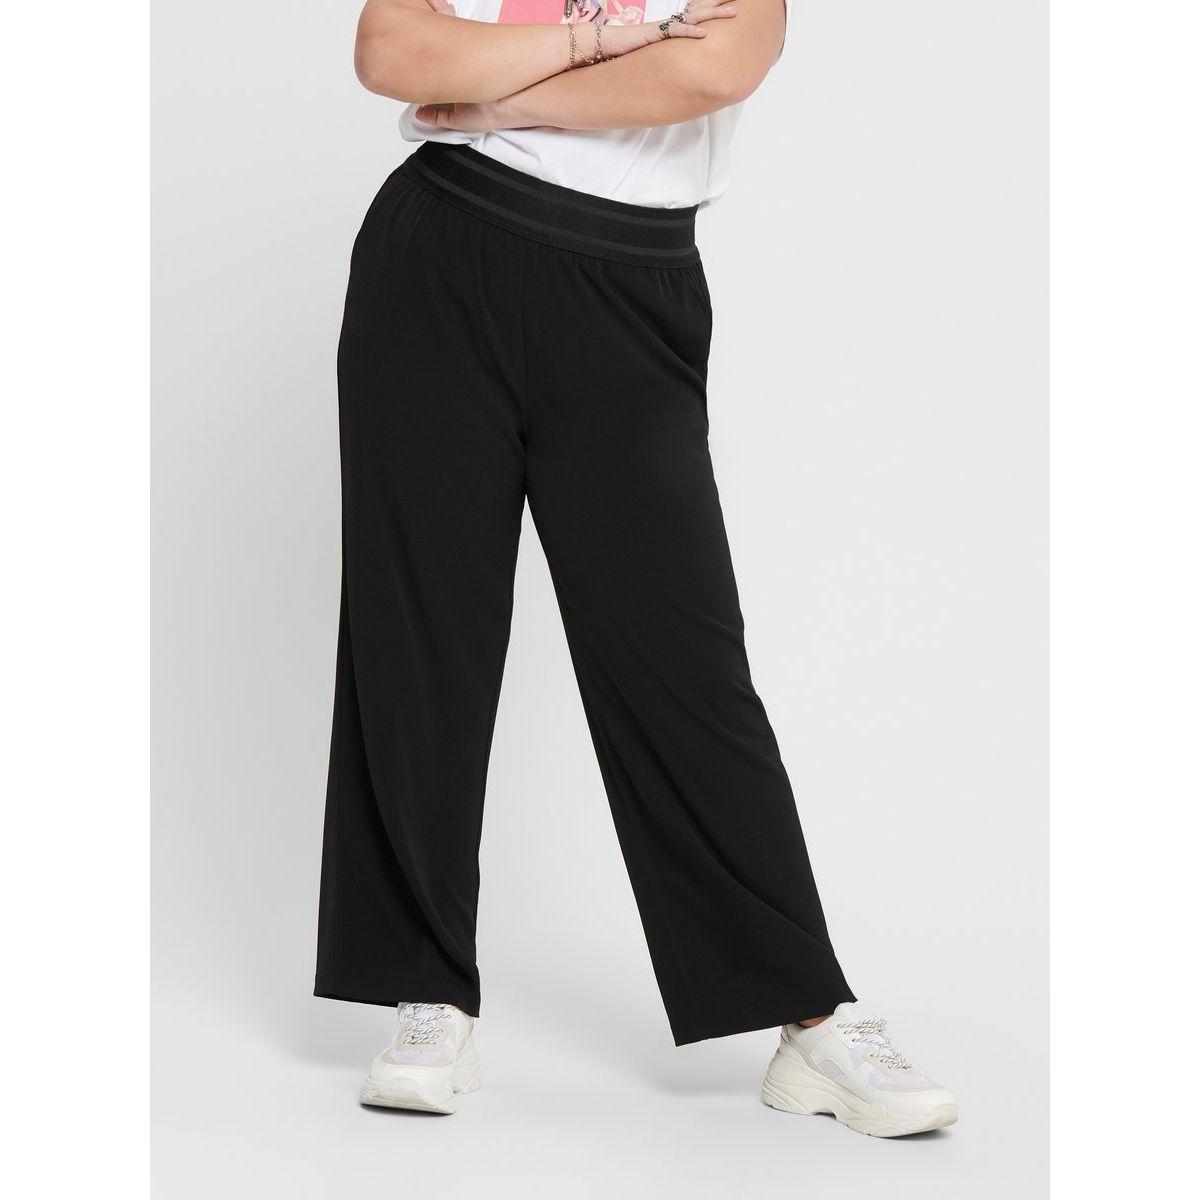 Pantalon Voluptueux, jambes amples